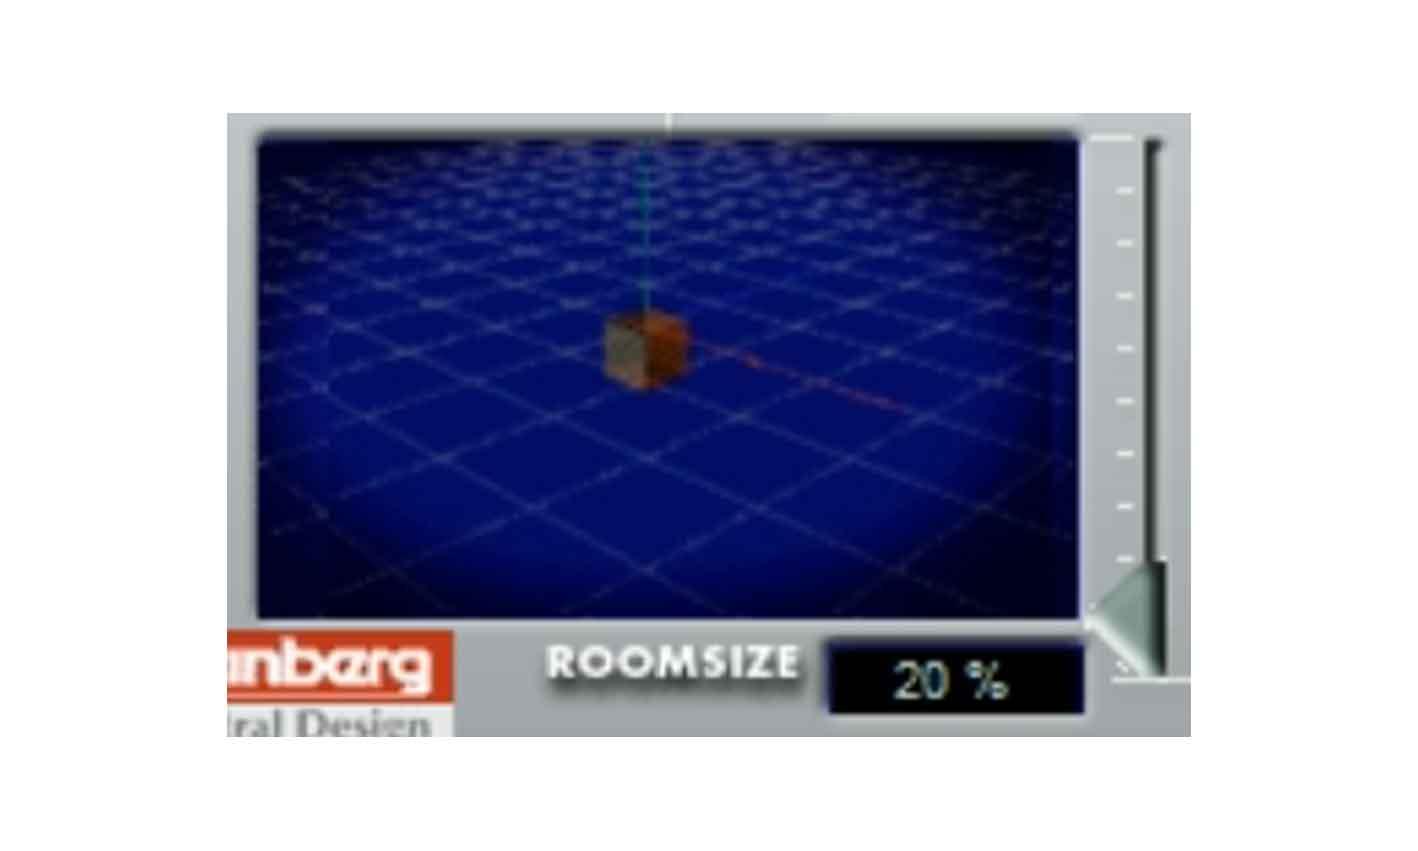 Screen shot of Steinberg(Spectral Design) Reverb 32 plugin room size